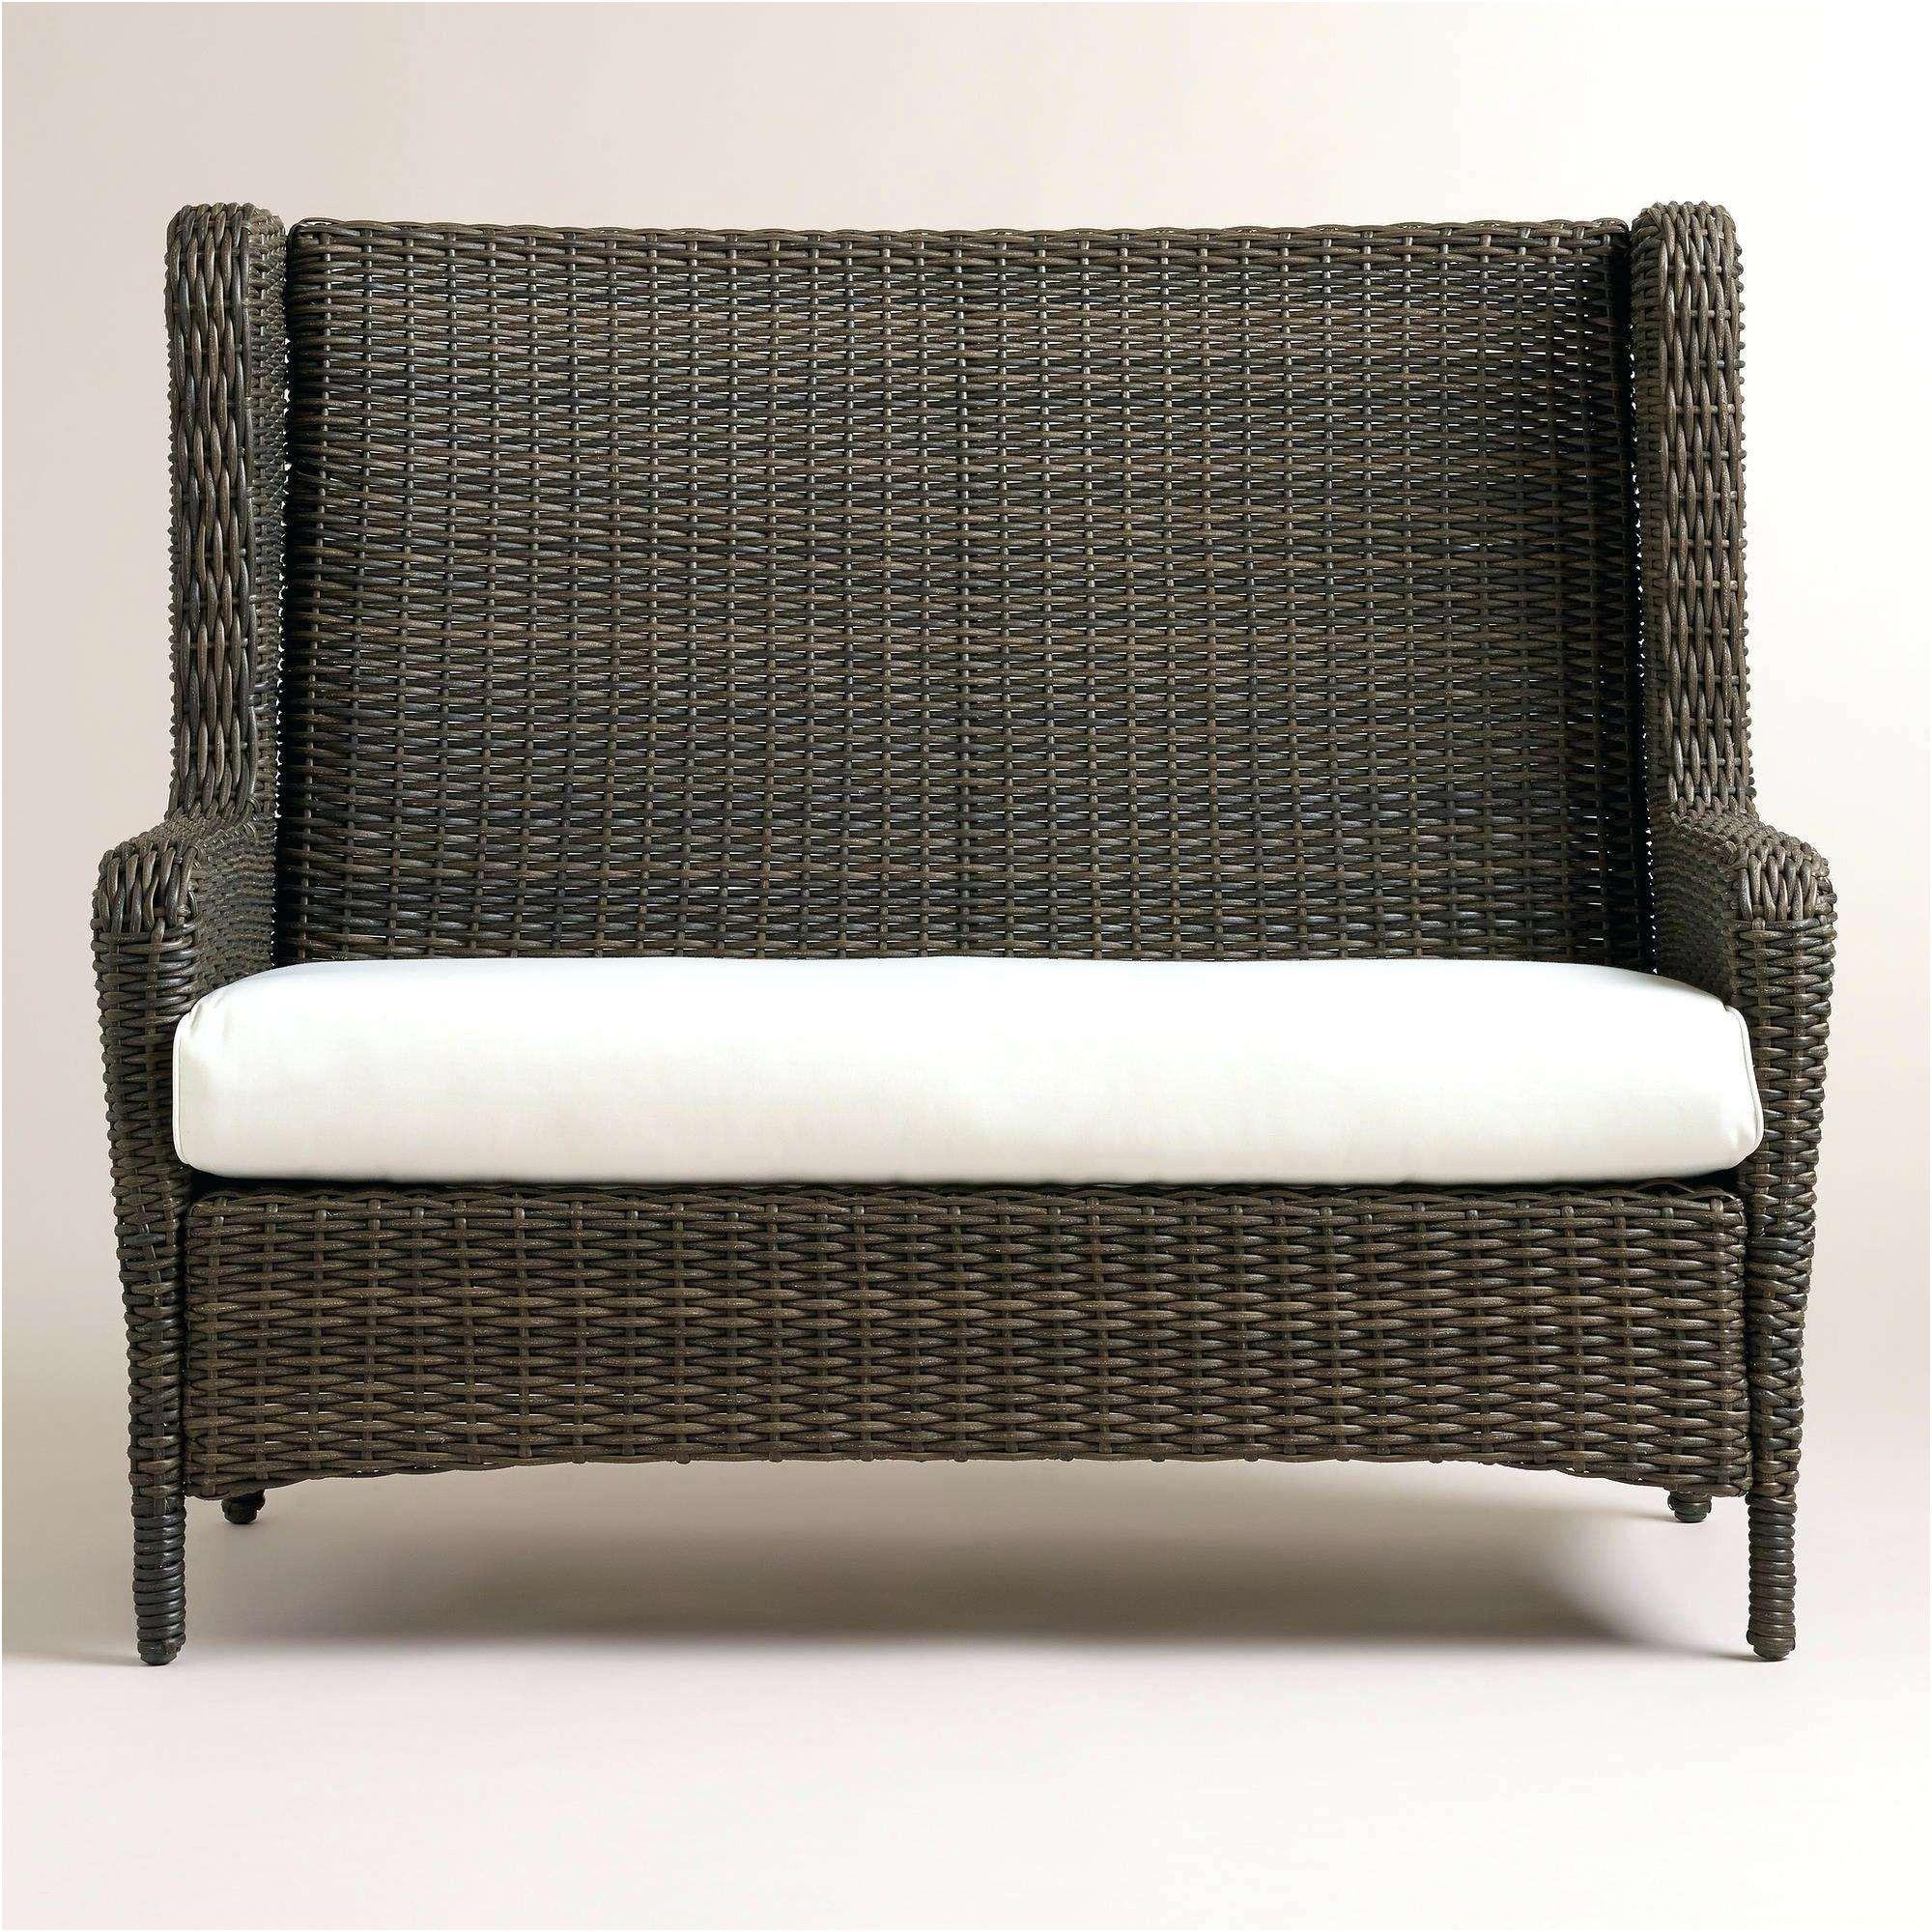 Schlafsofa Roller Neu Couch Sofa Gnstig Elegant Cool Cool Big Sofa Poco Billig Big Sofa Rolle In 2020 Patio Cushions Clearance Patio Furniture Wicker Patio Furniture